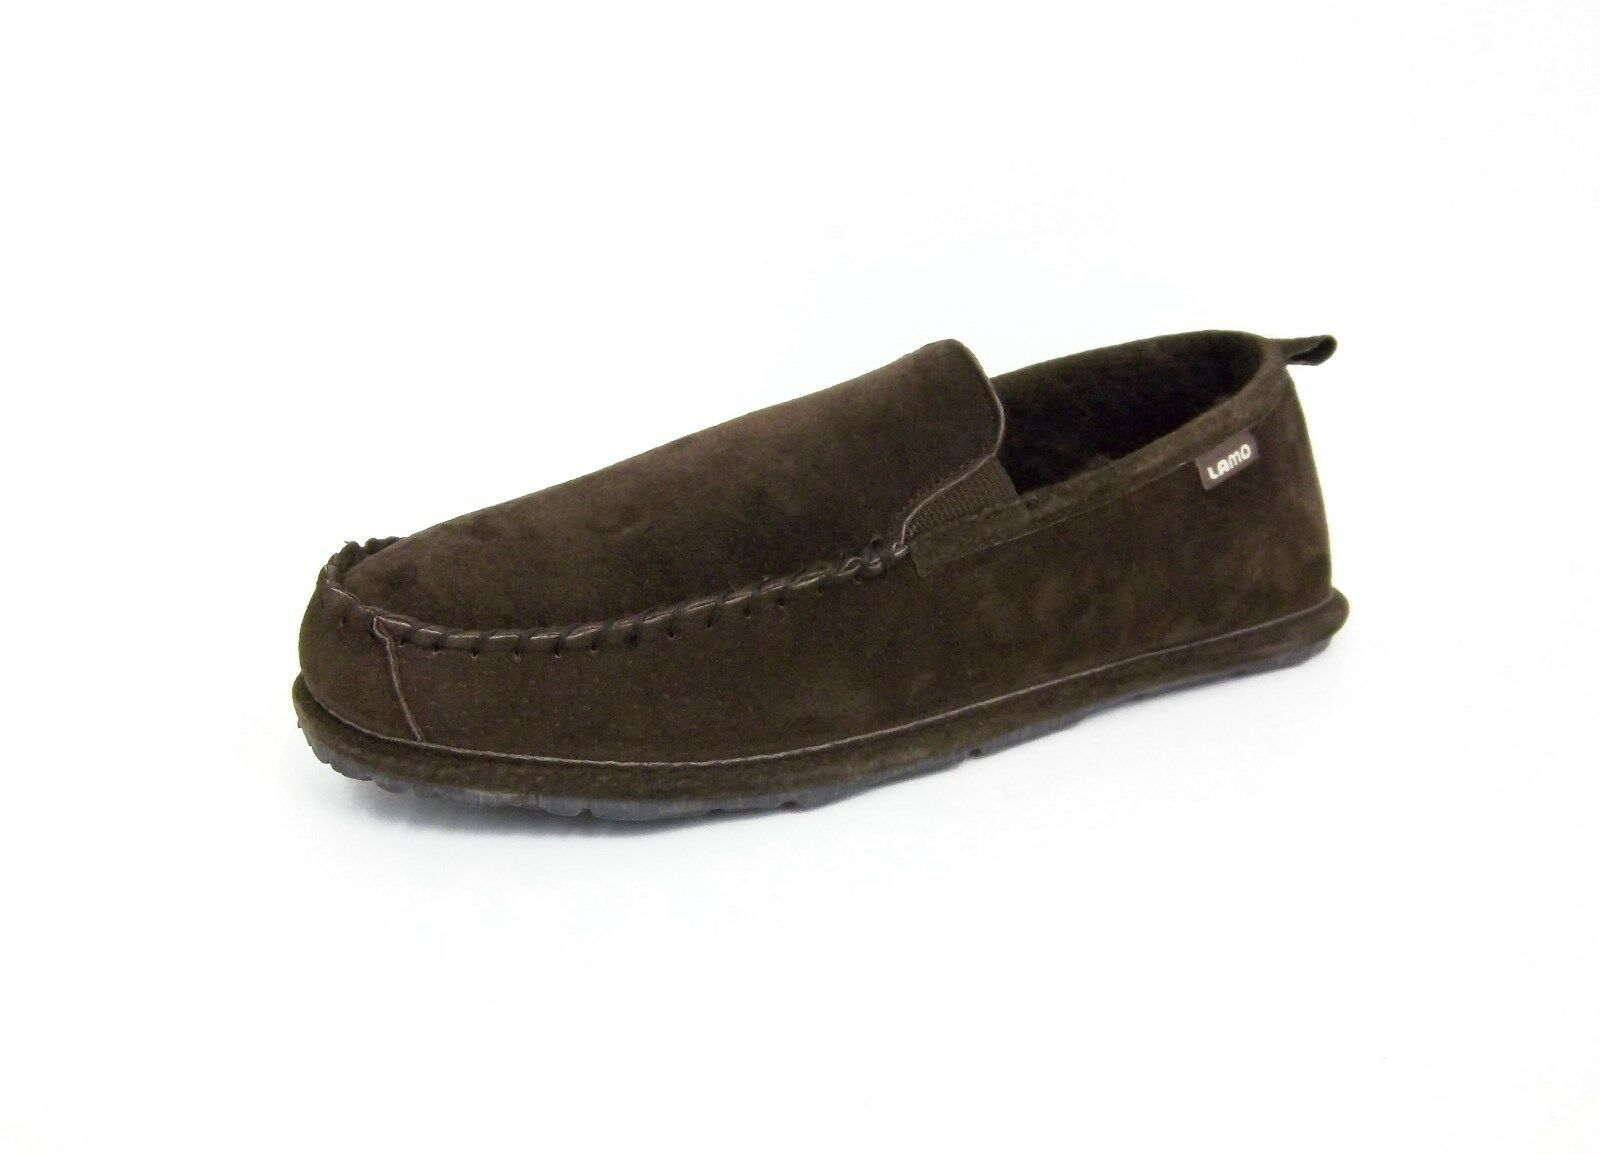 Lamo Mens EM1246 Newport Slip On Slipper,Chocolate